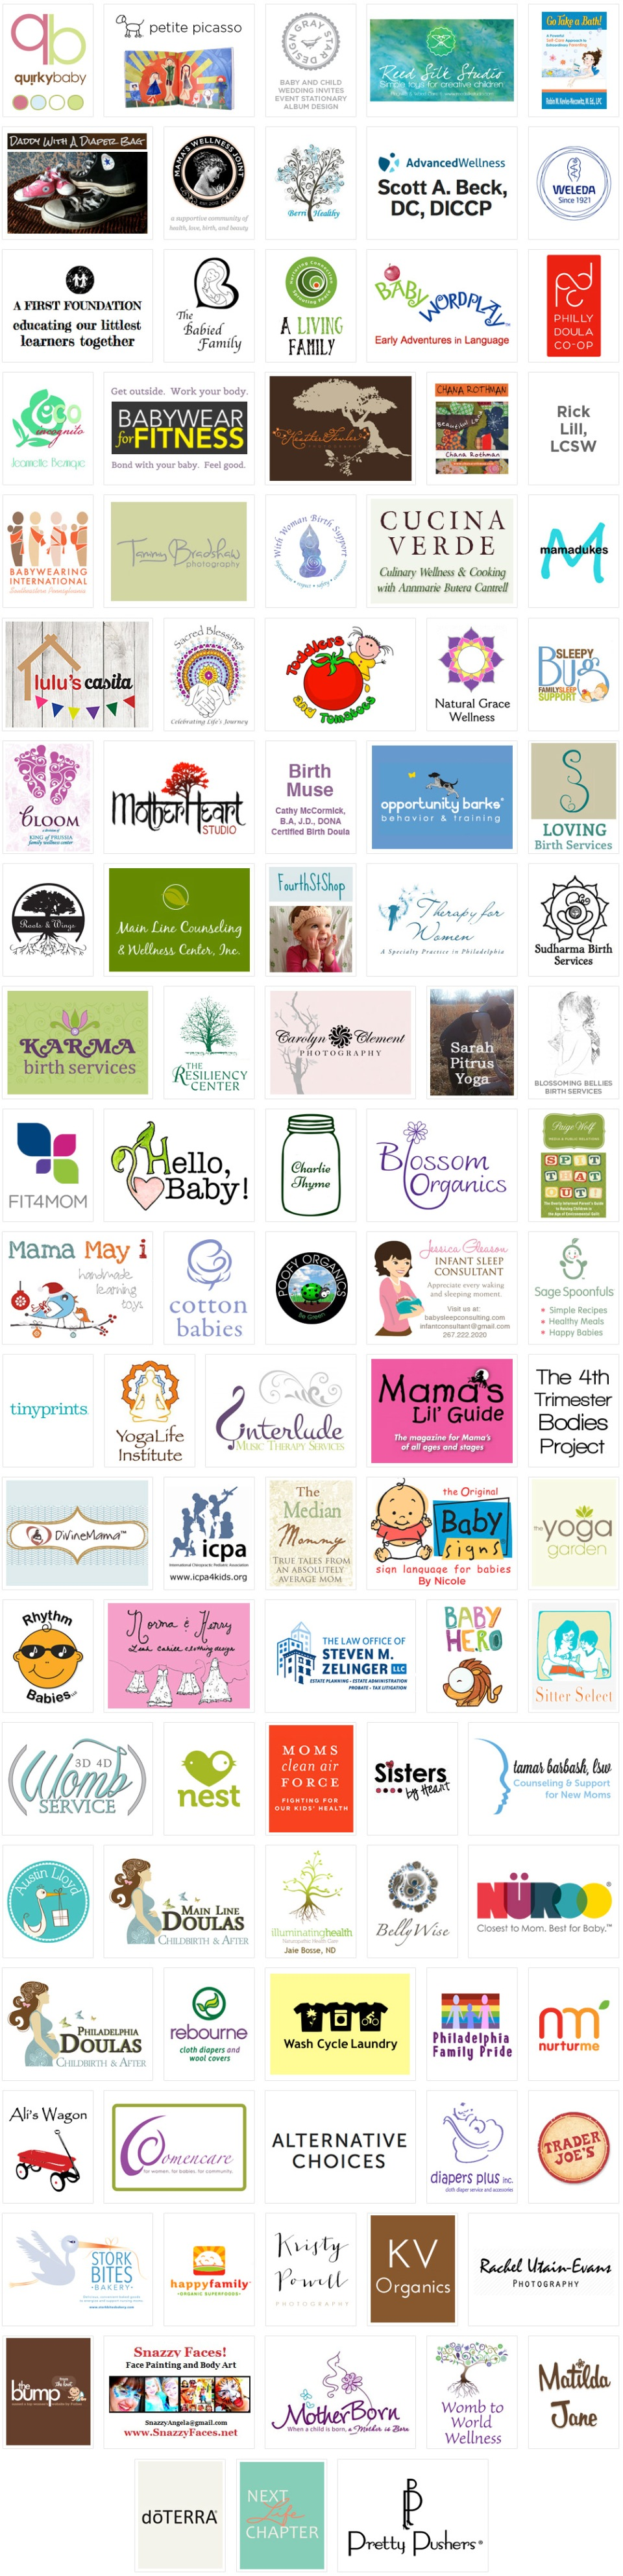 2014 partners